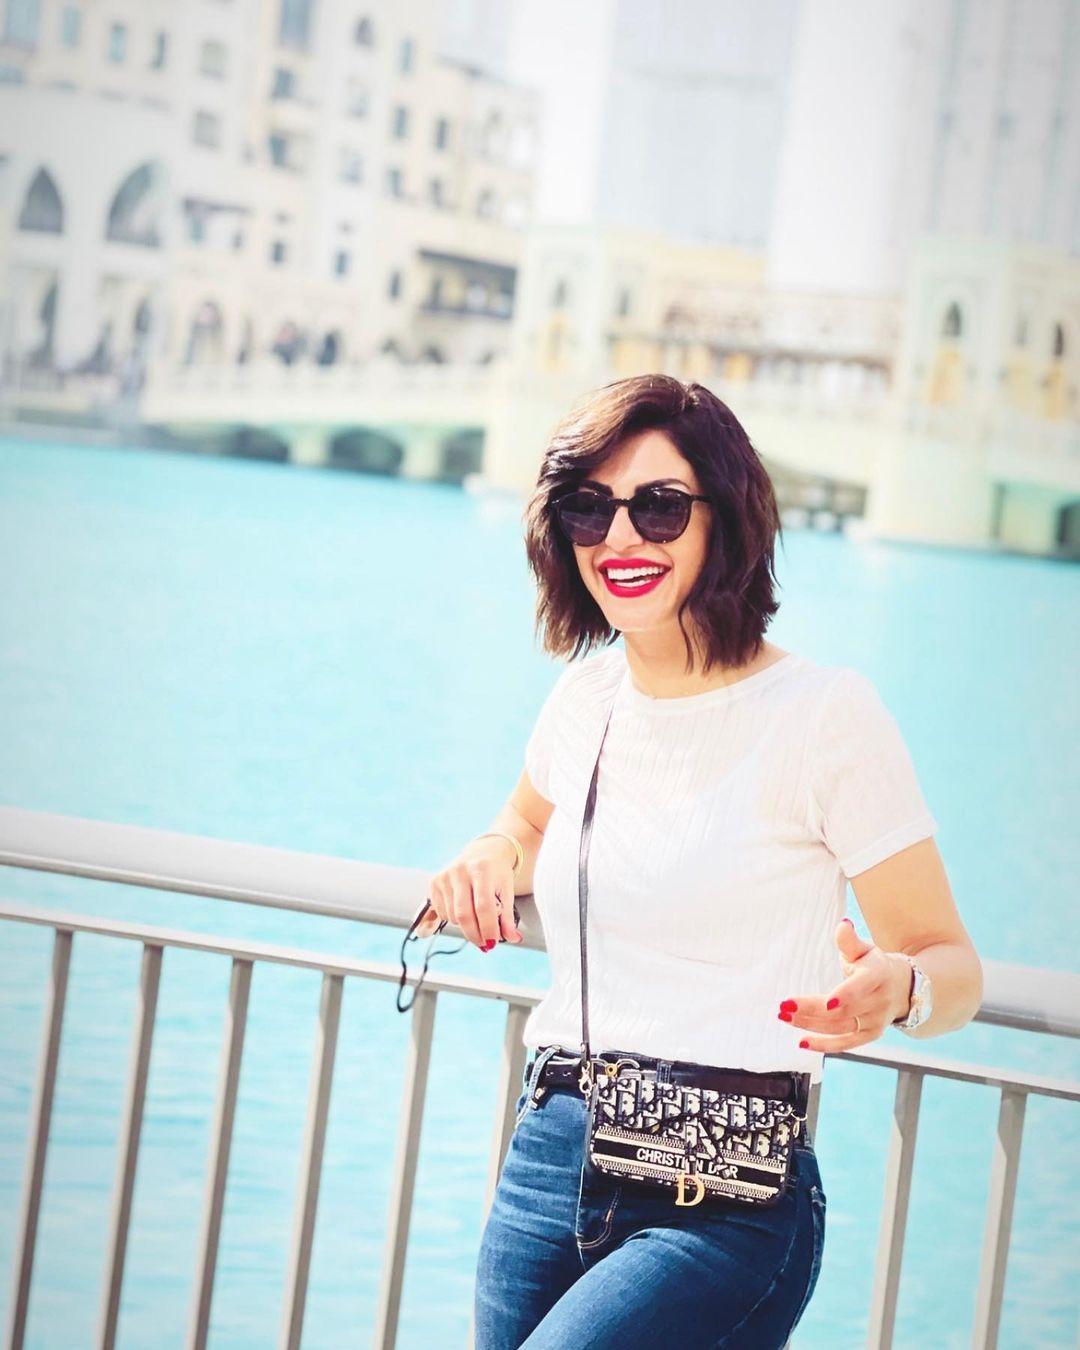 In hot clothes, Menna Fadali catches the eye in Dubai